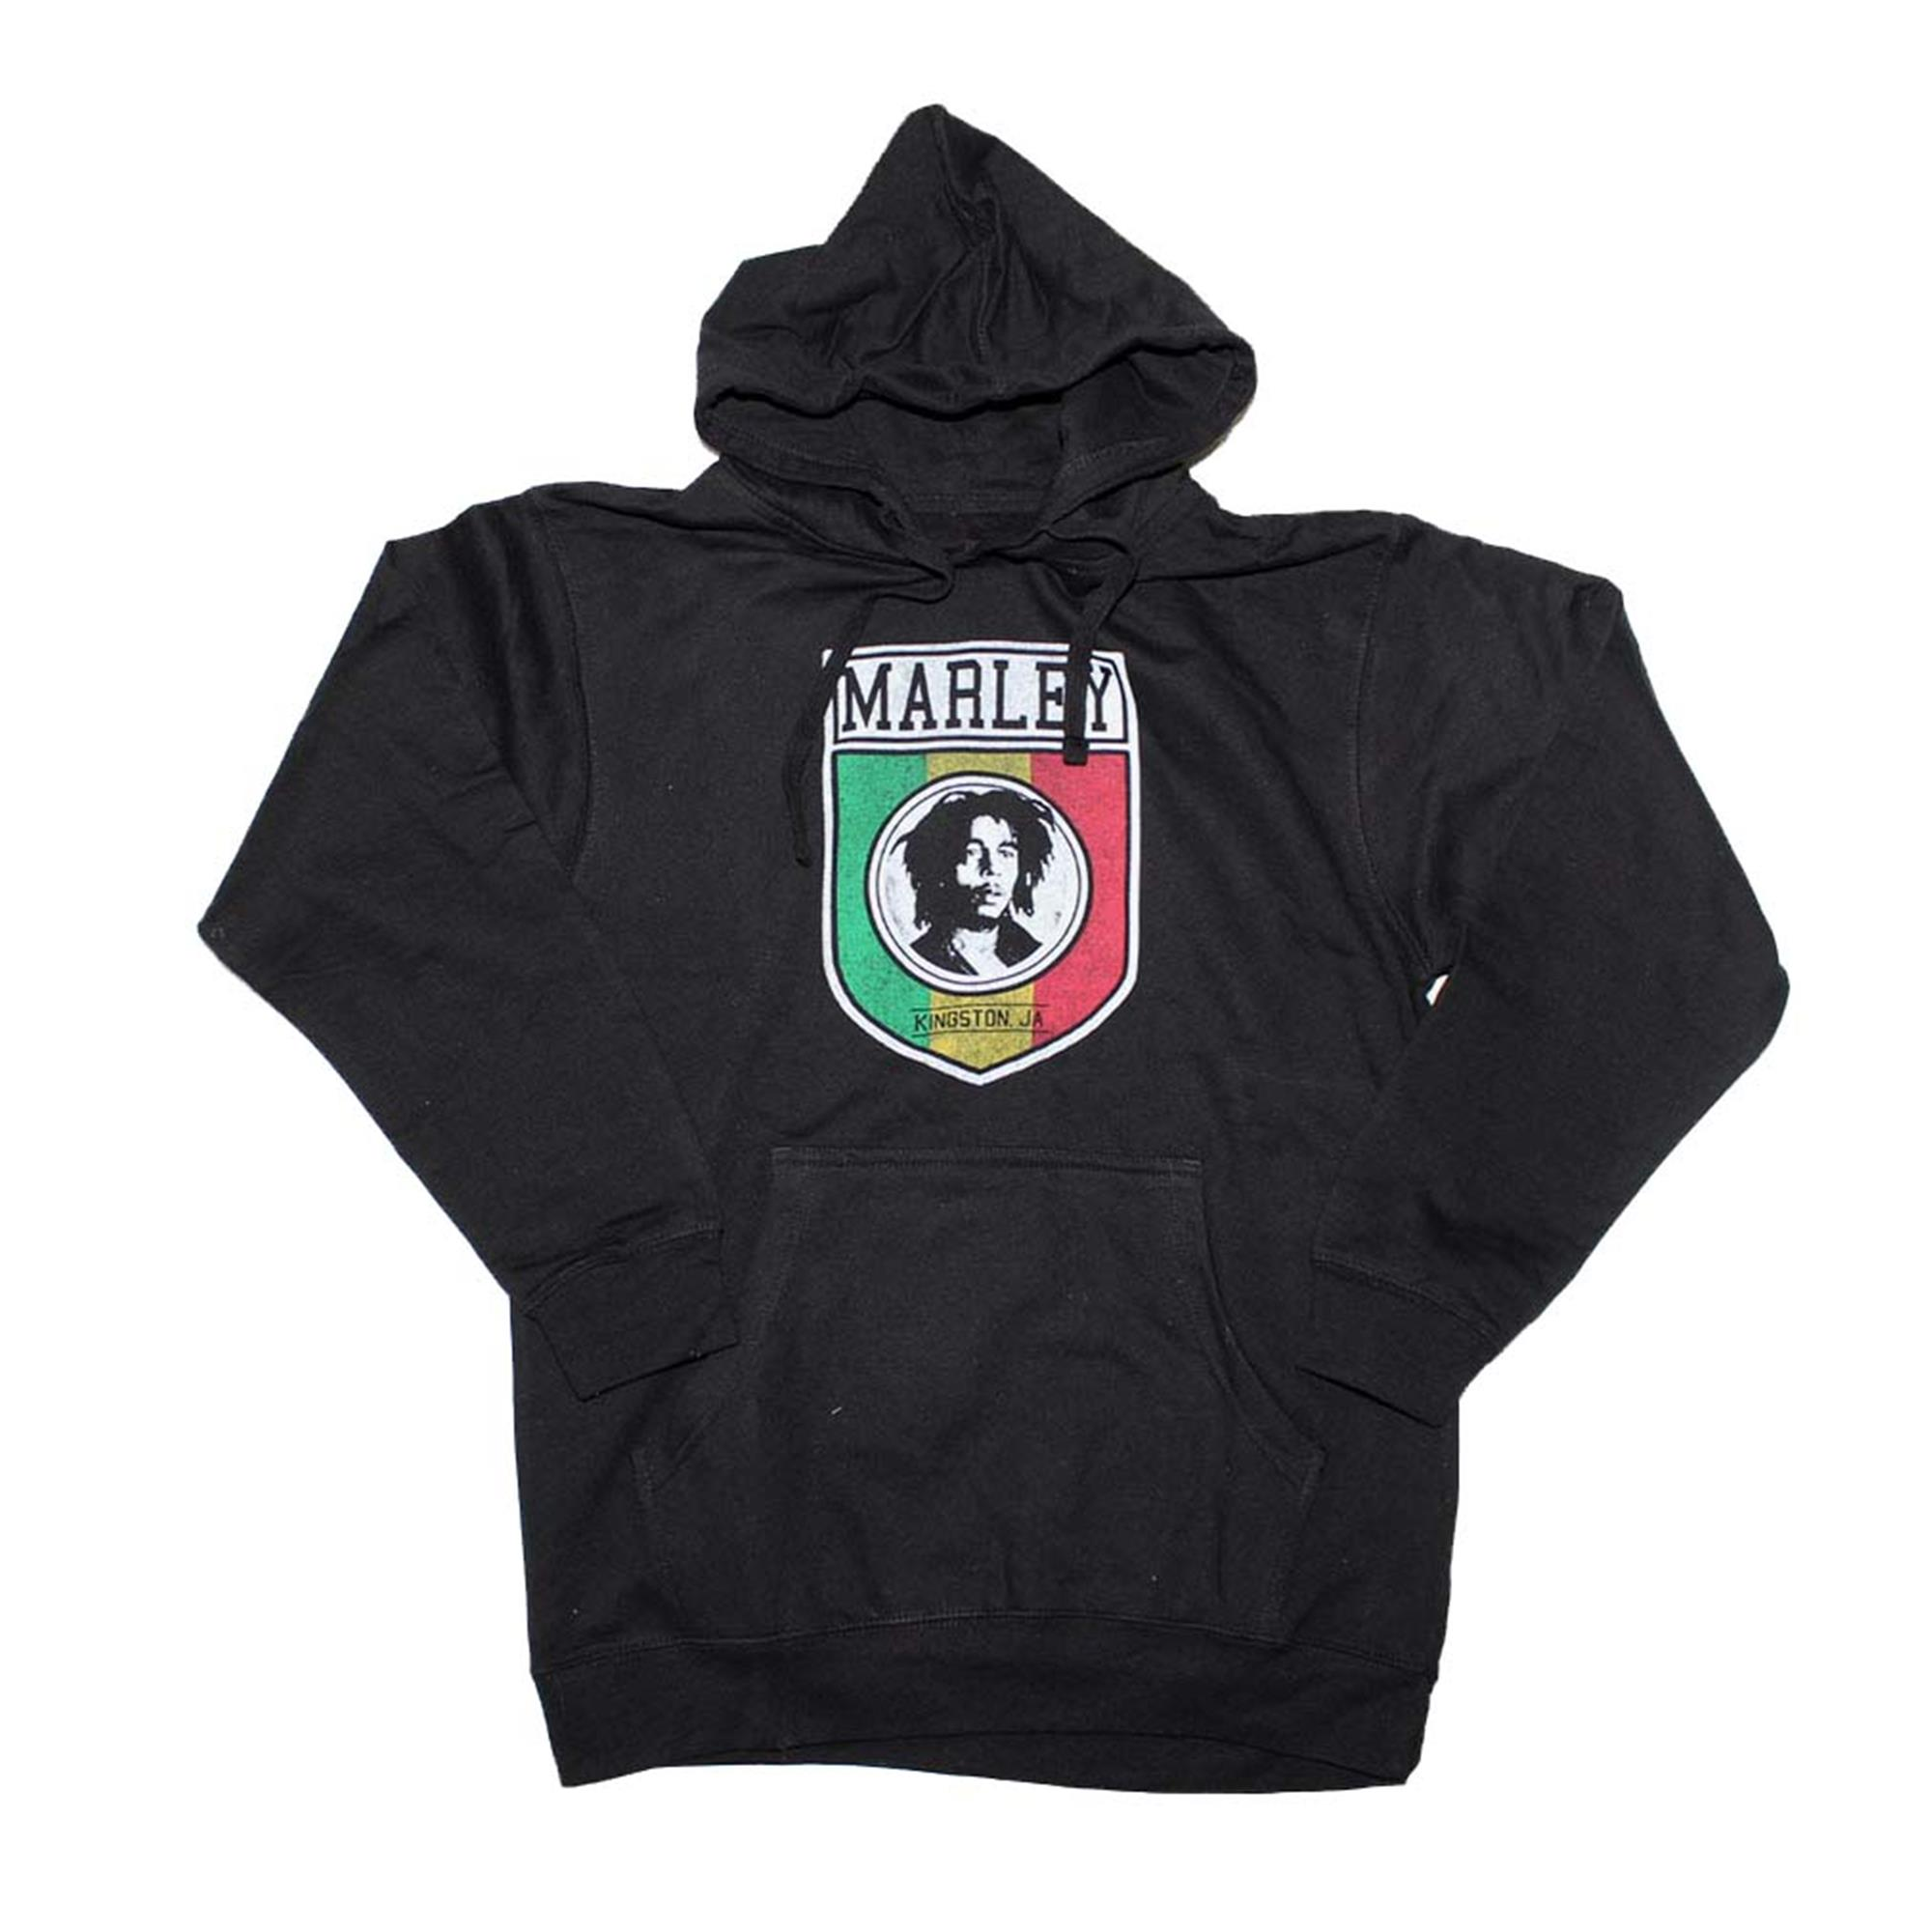 Bob Marley Kingston Shield Pullover Hoodie Sweatshirt